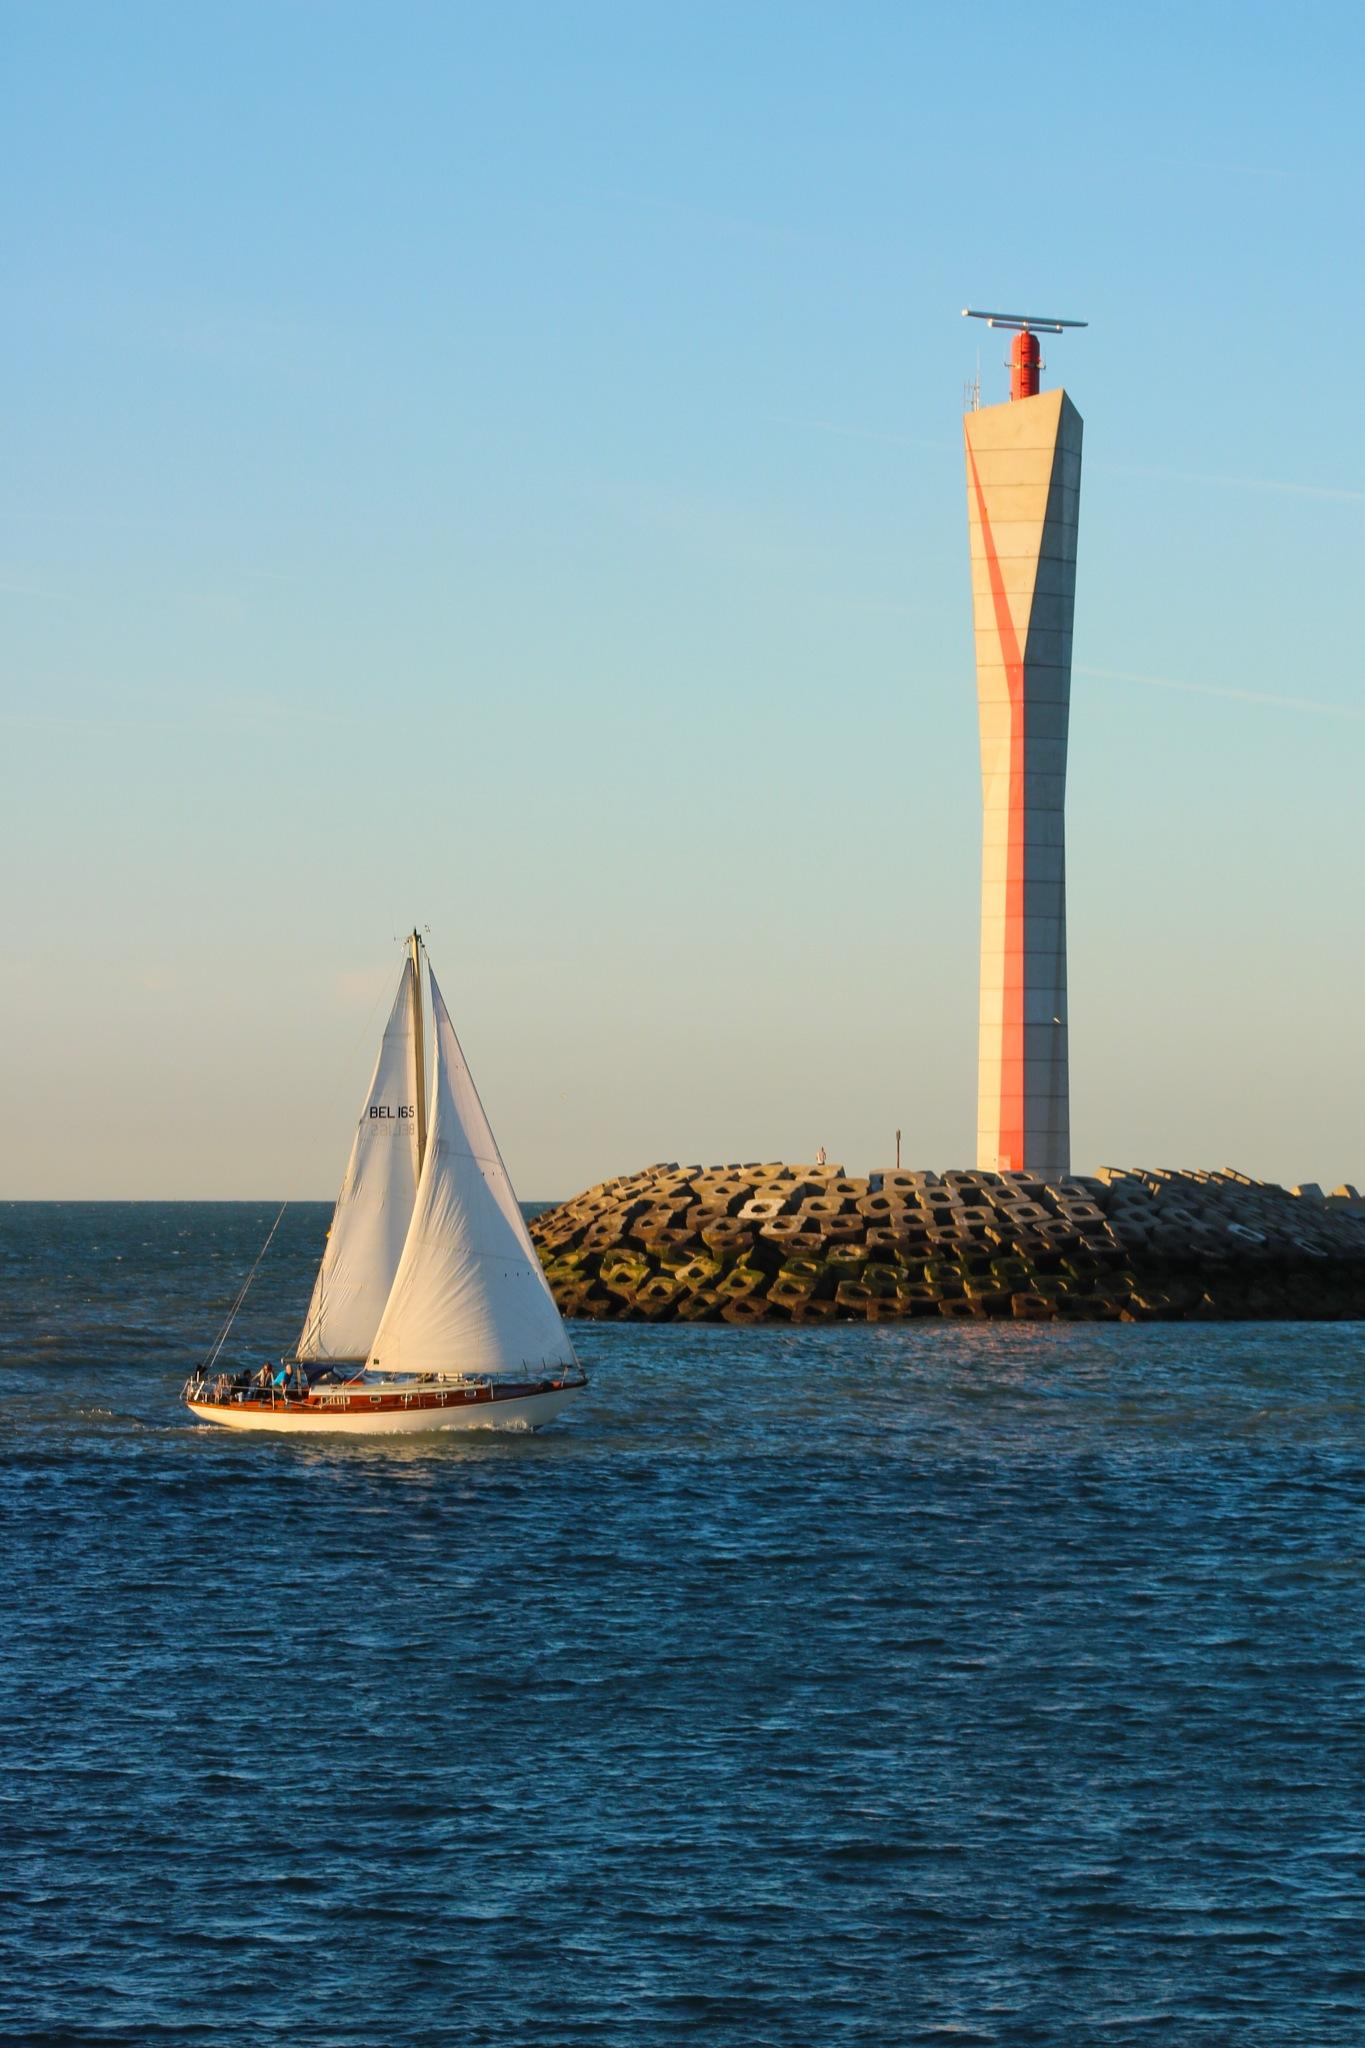 Sailboat by Ivan Samoshko